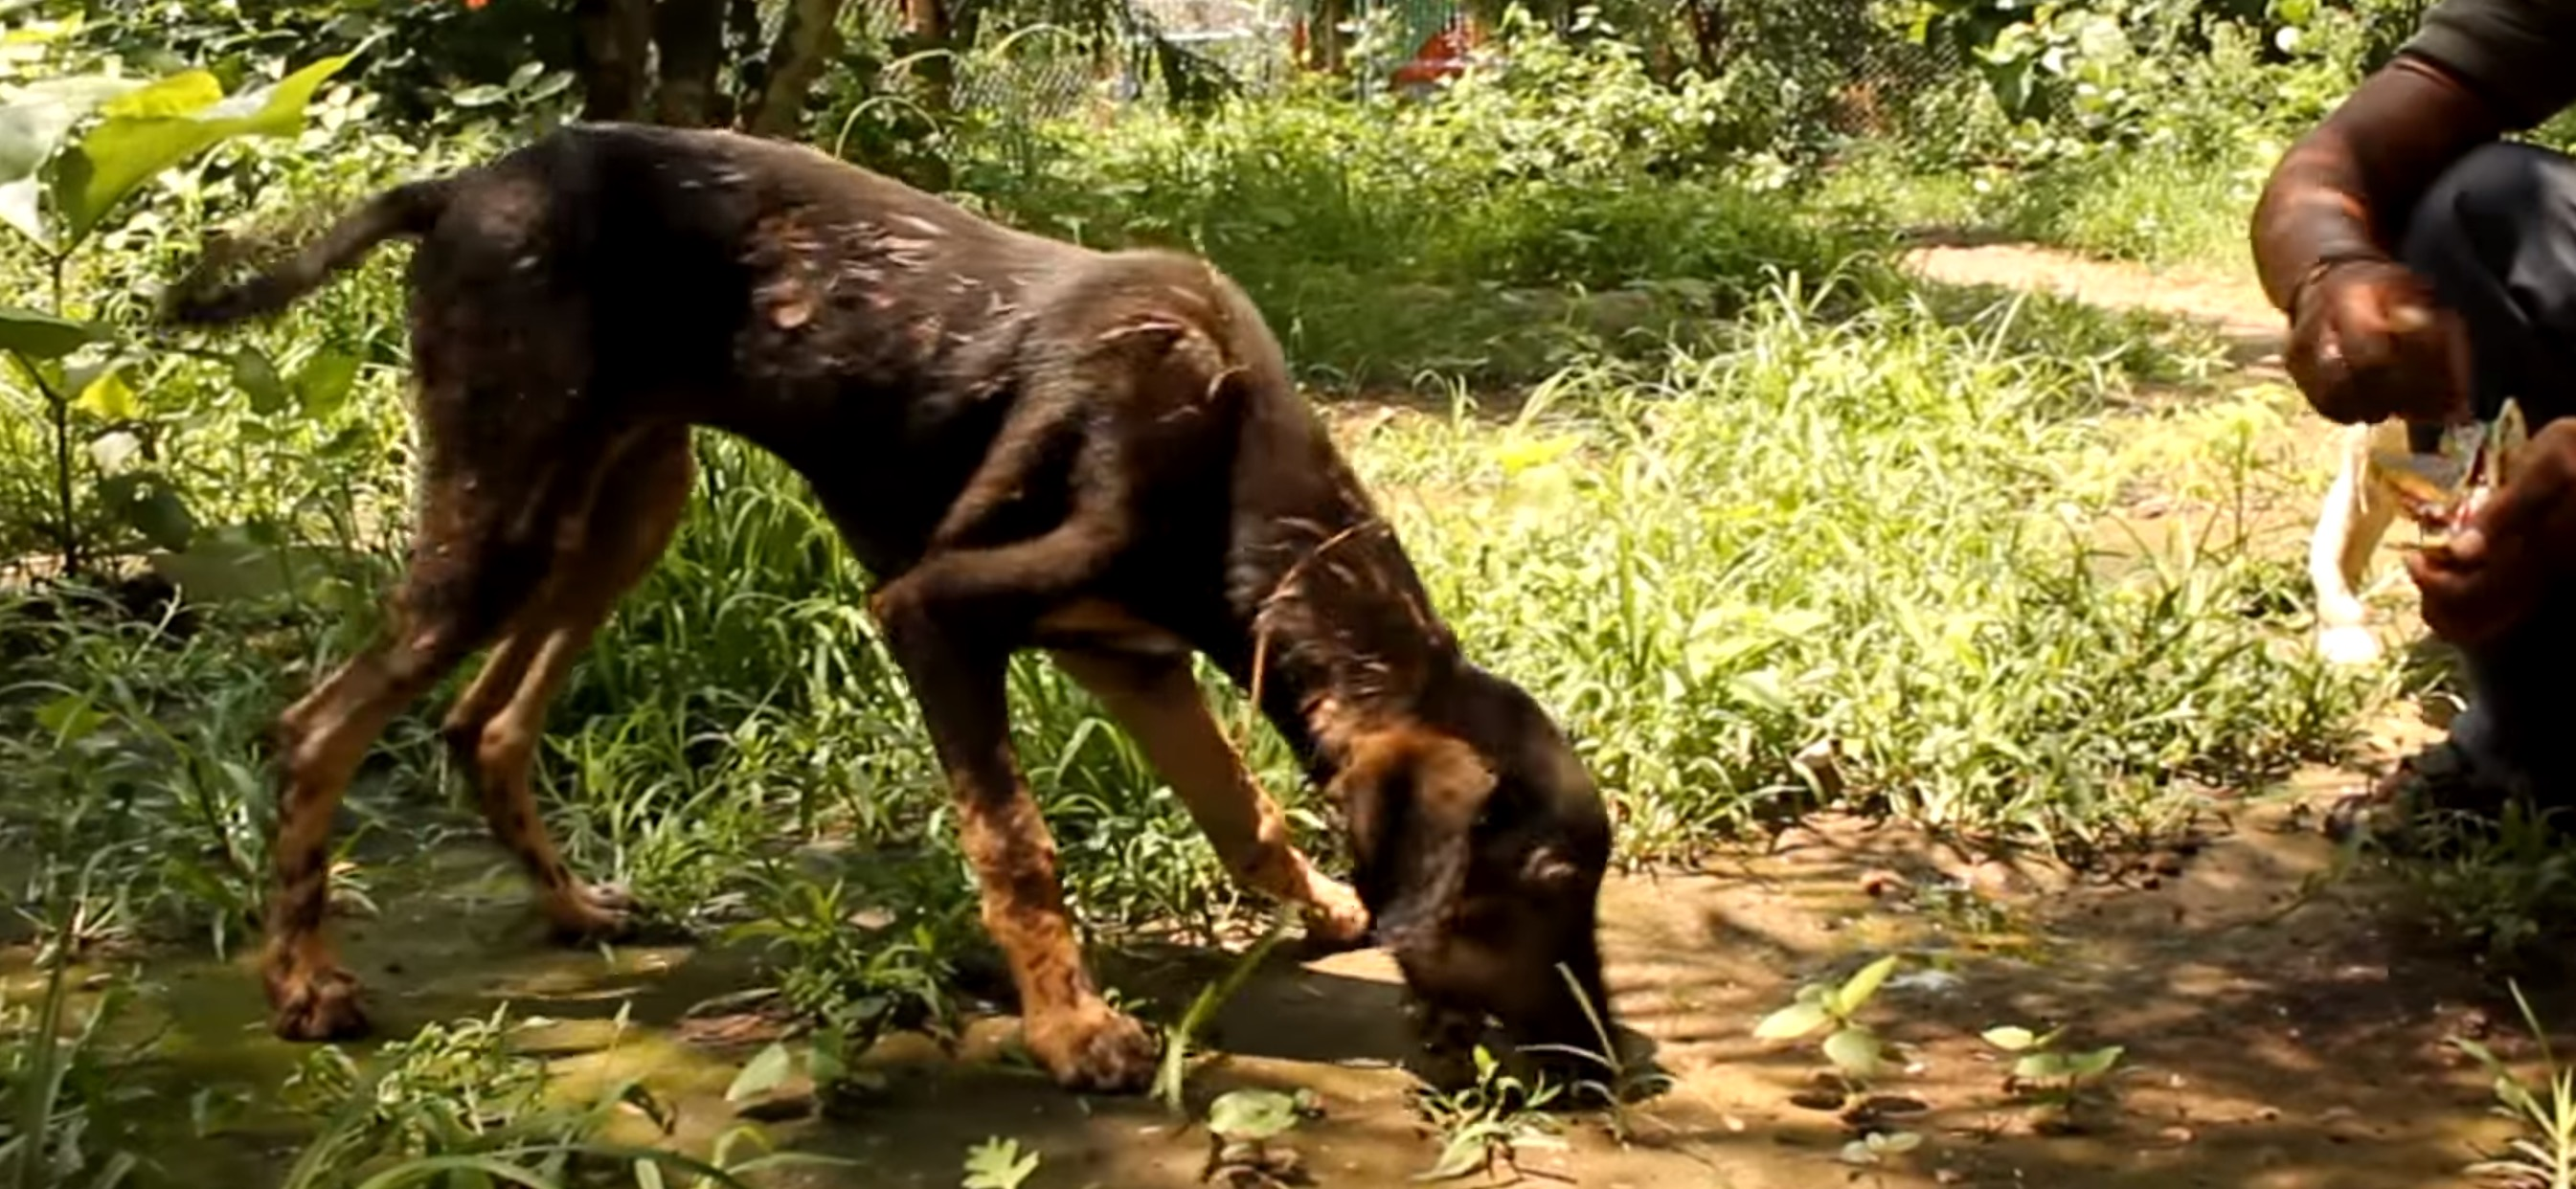 chien-goudron-sauvetage-inde-12